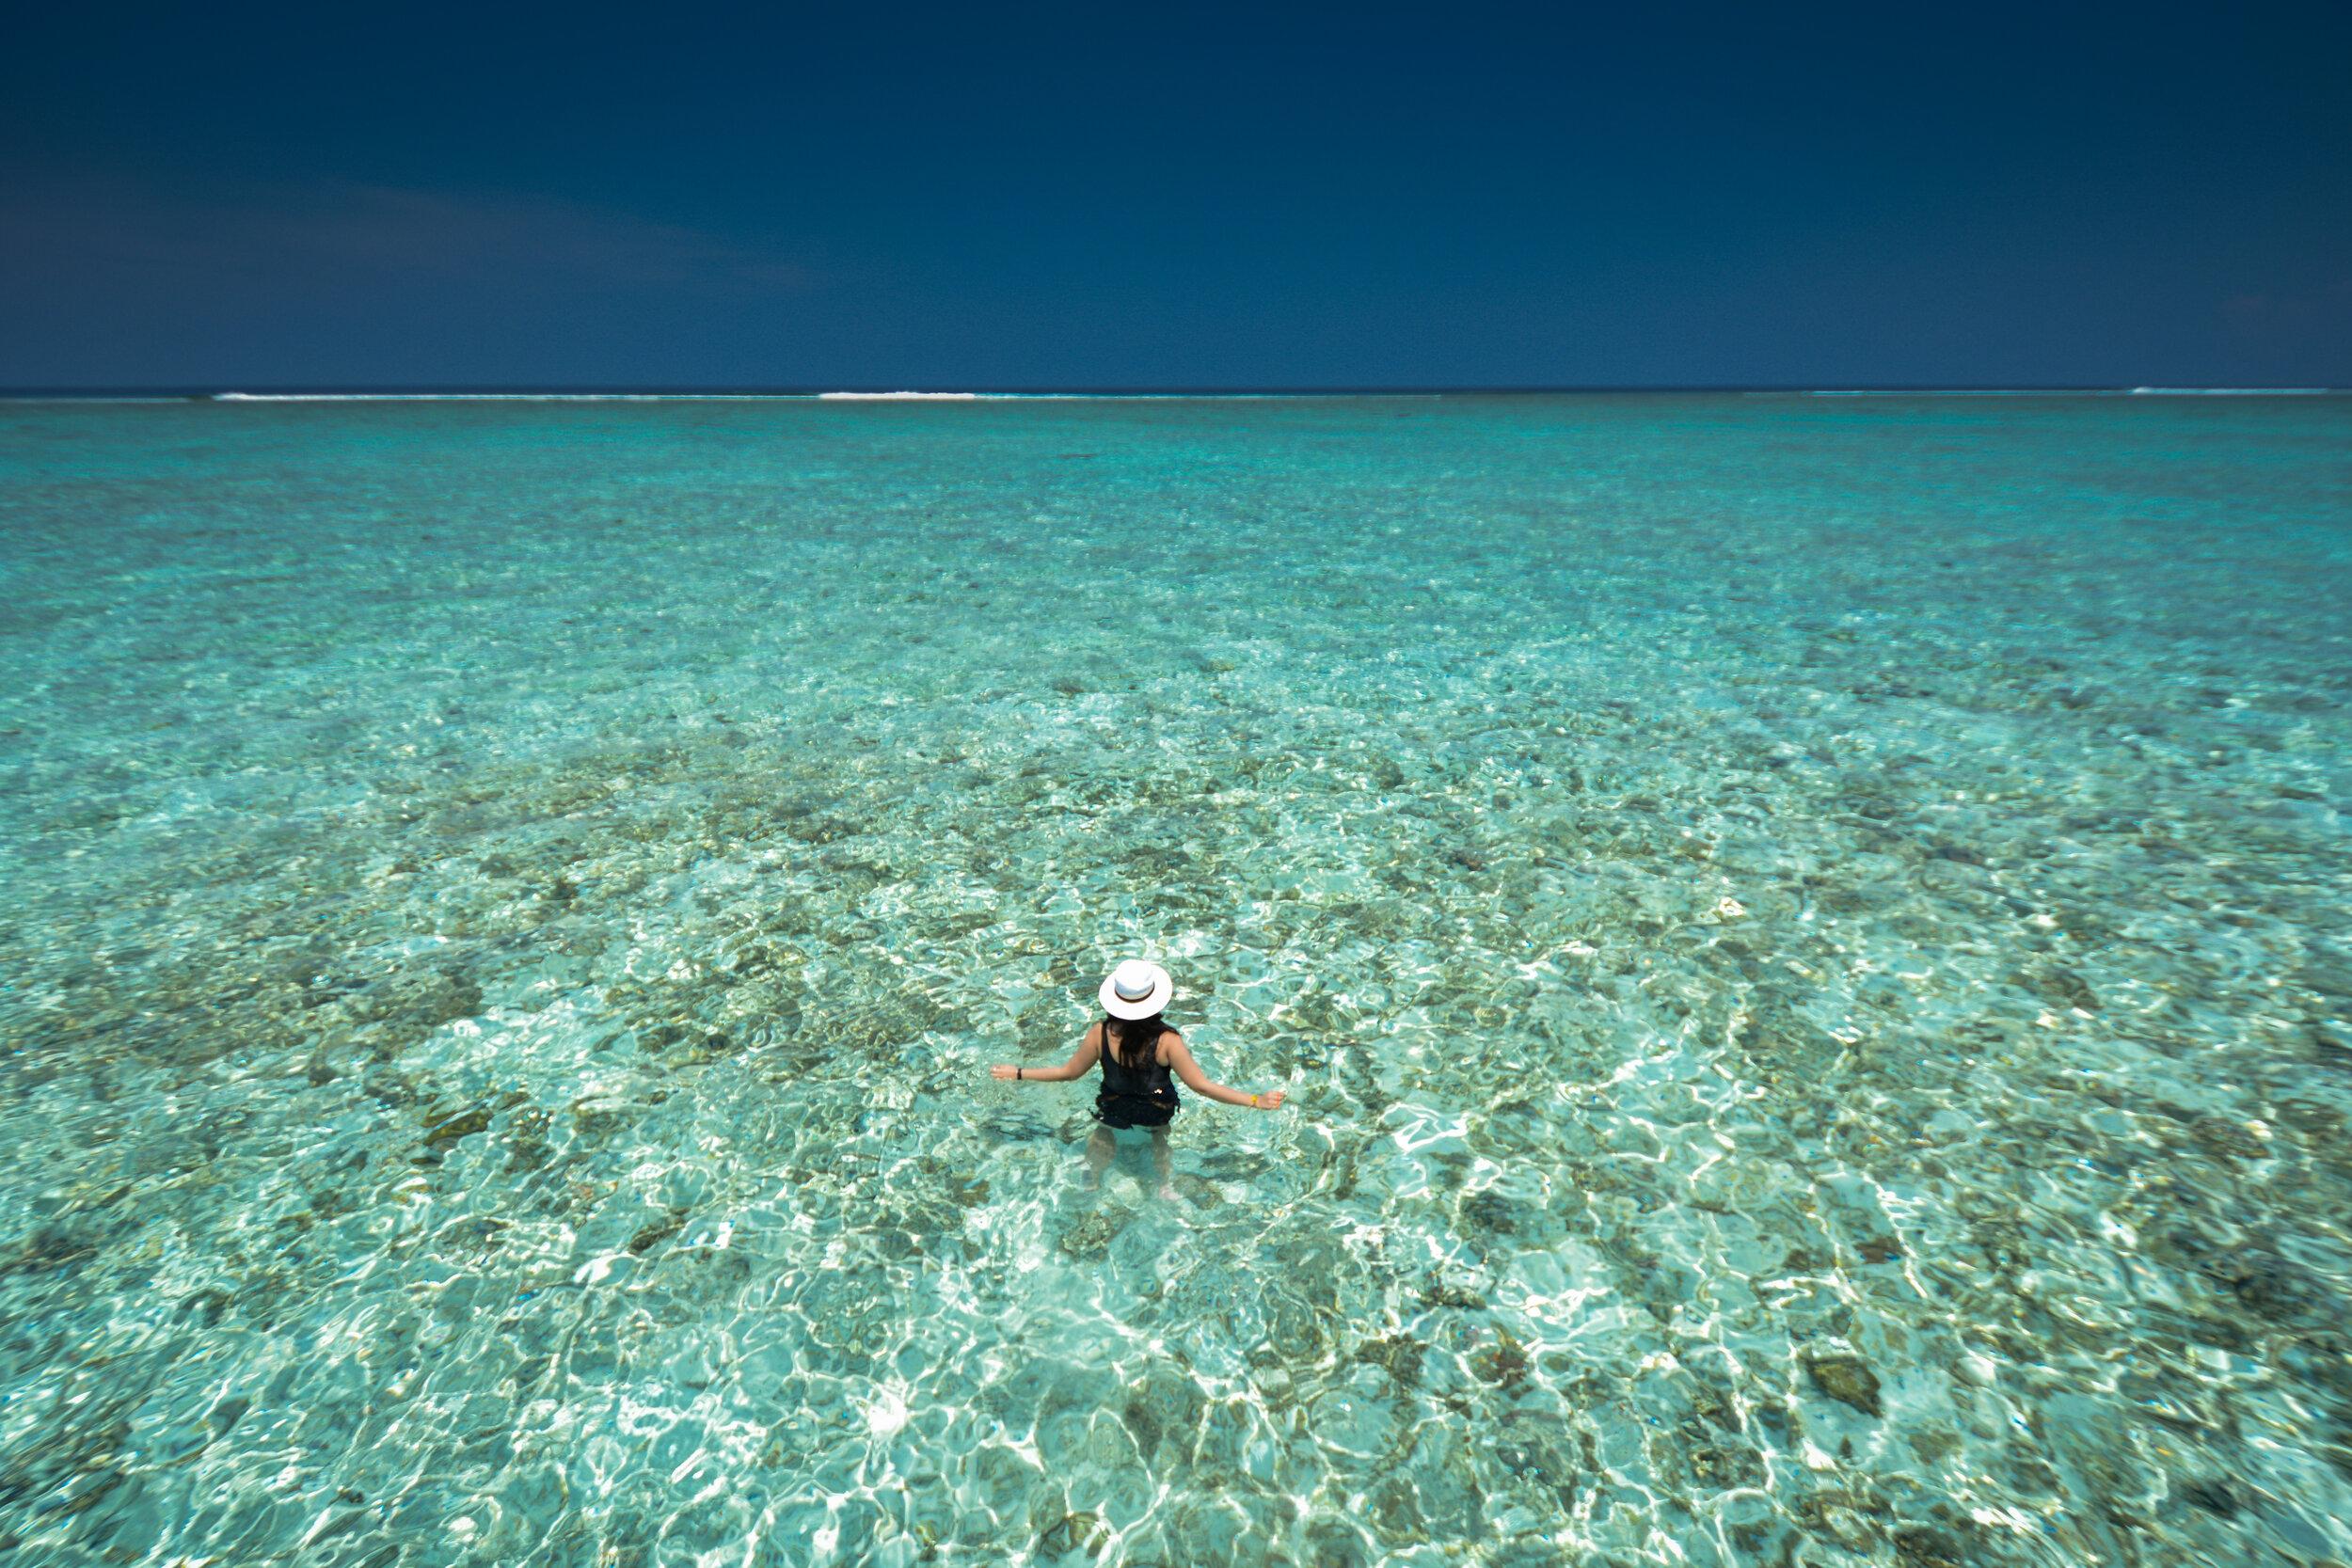 Maldives Visa On Arrival Guide For Filipinos Tips On Getting Work Visa Tourist Visa Extension